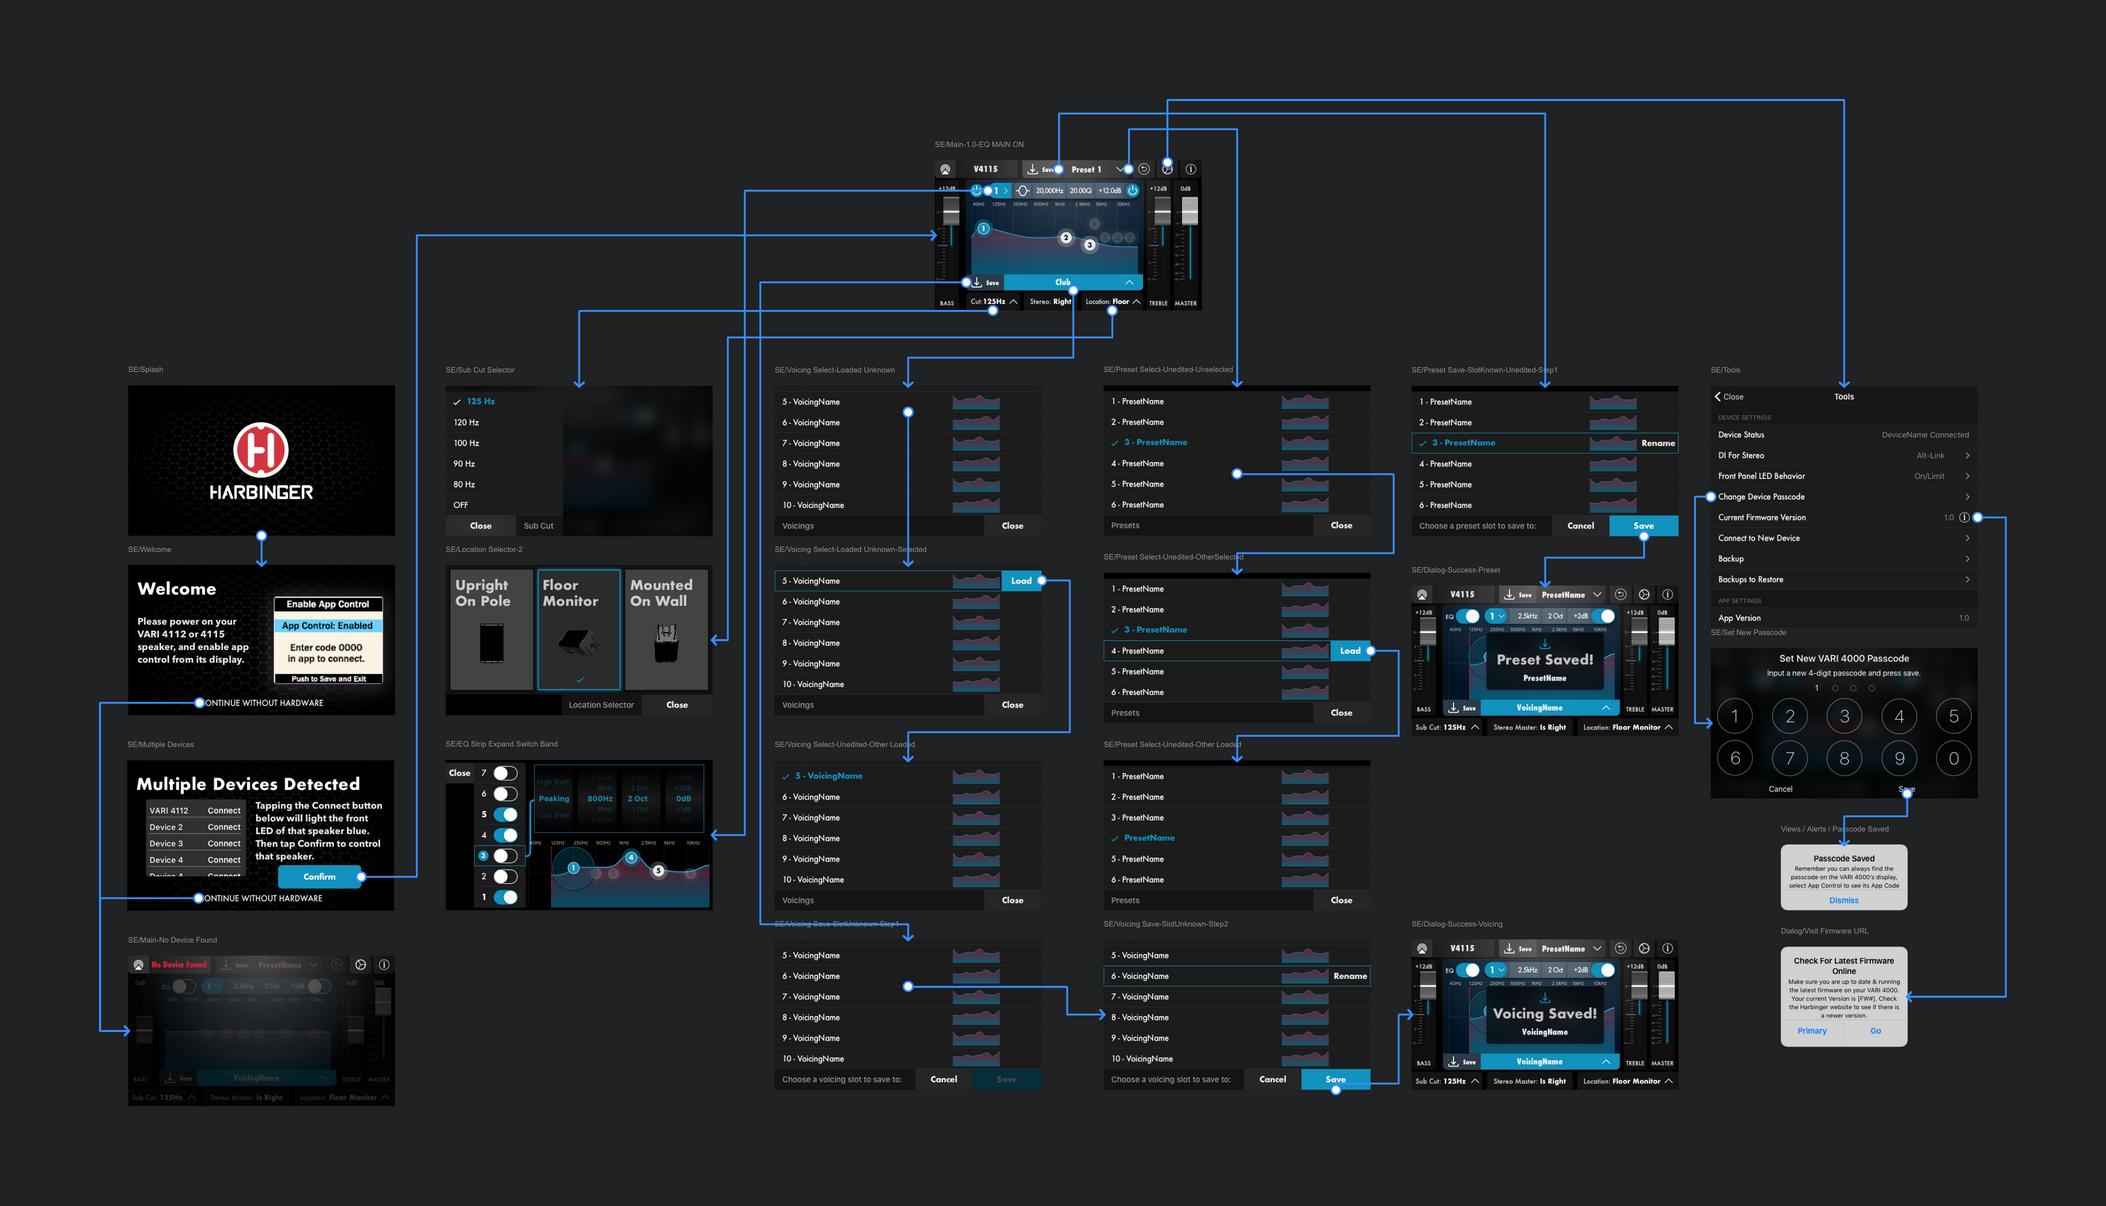 The final user flow map